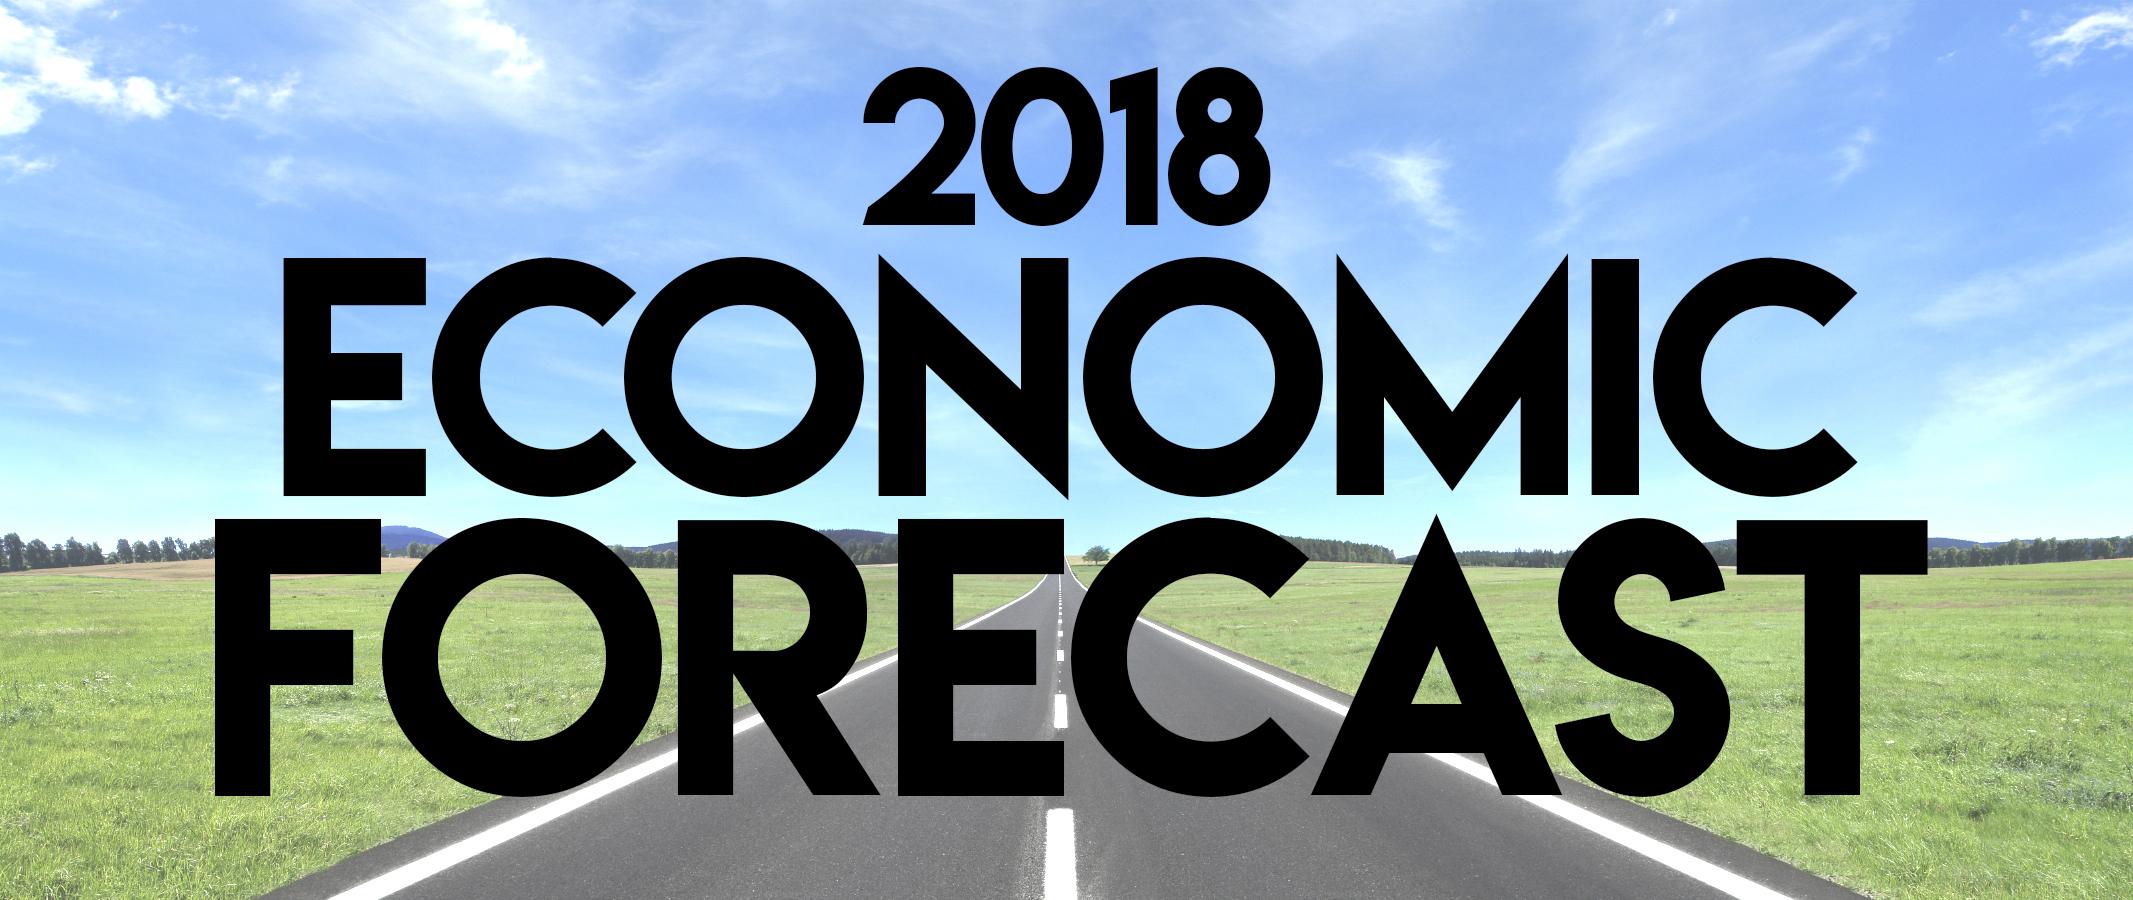 2018 economic forecast